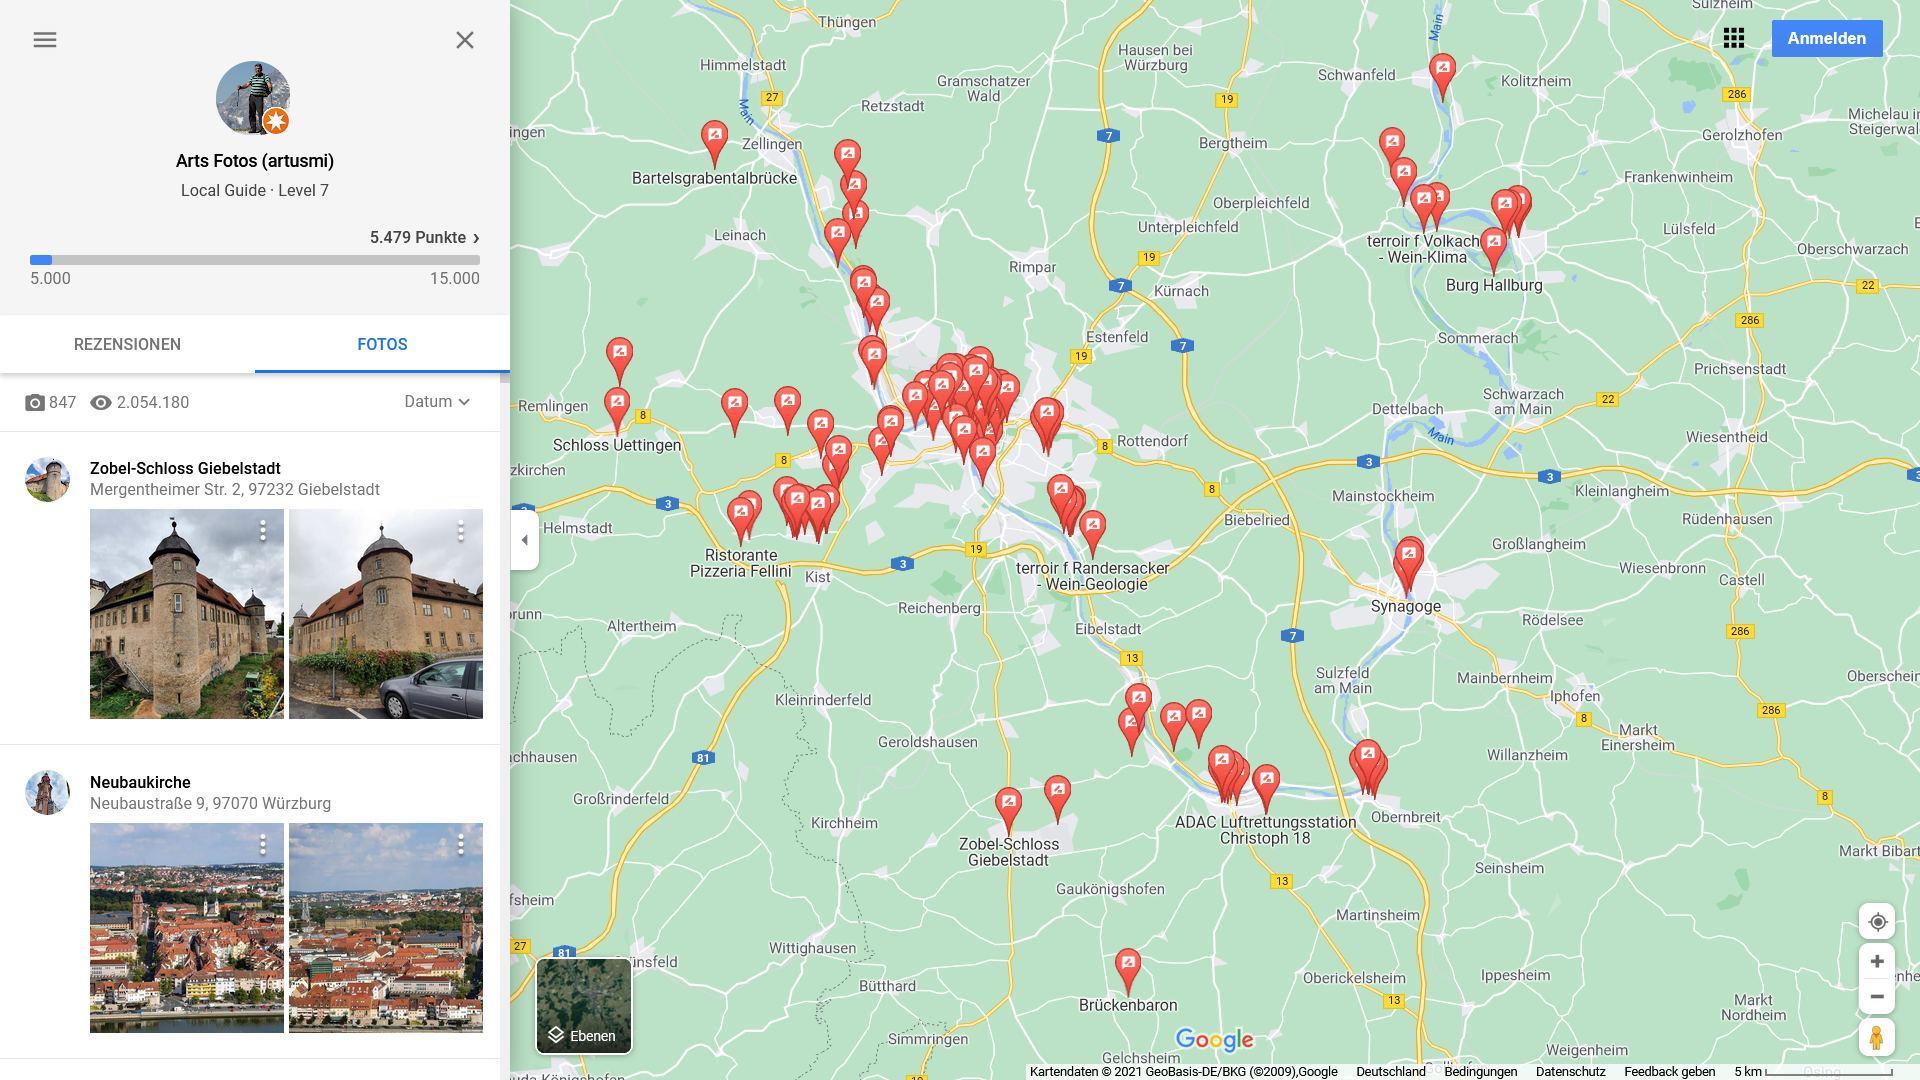 Arts Fotos auf Google Maps am 19. September 2021